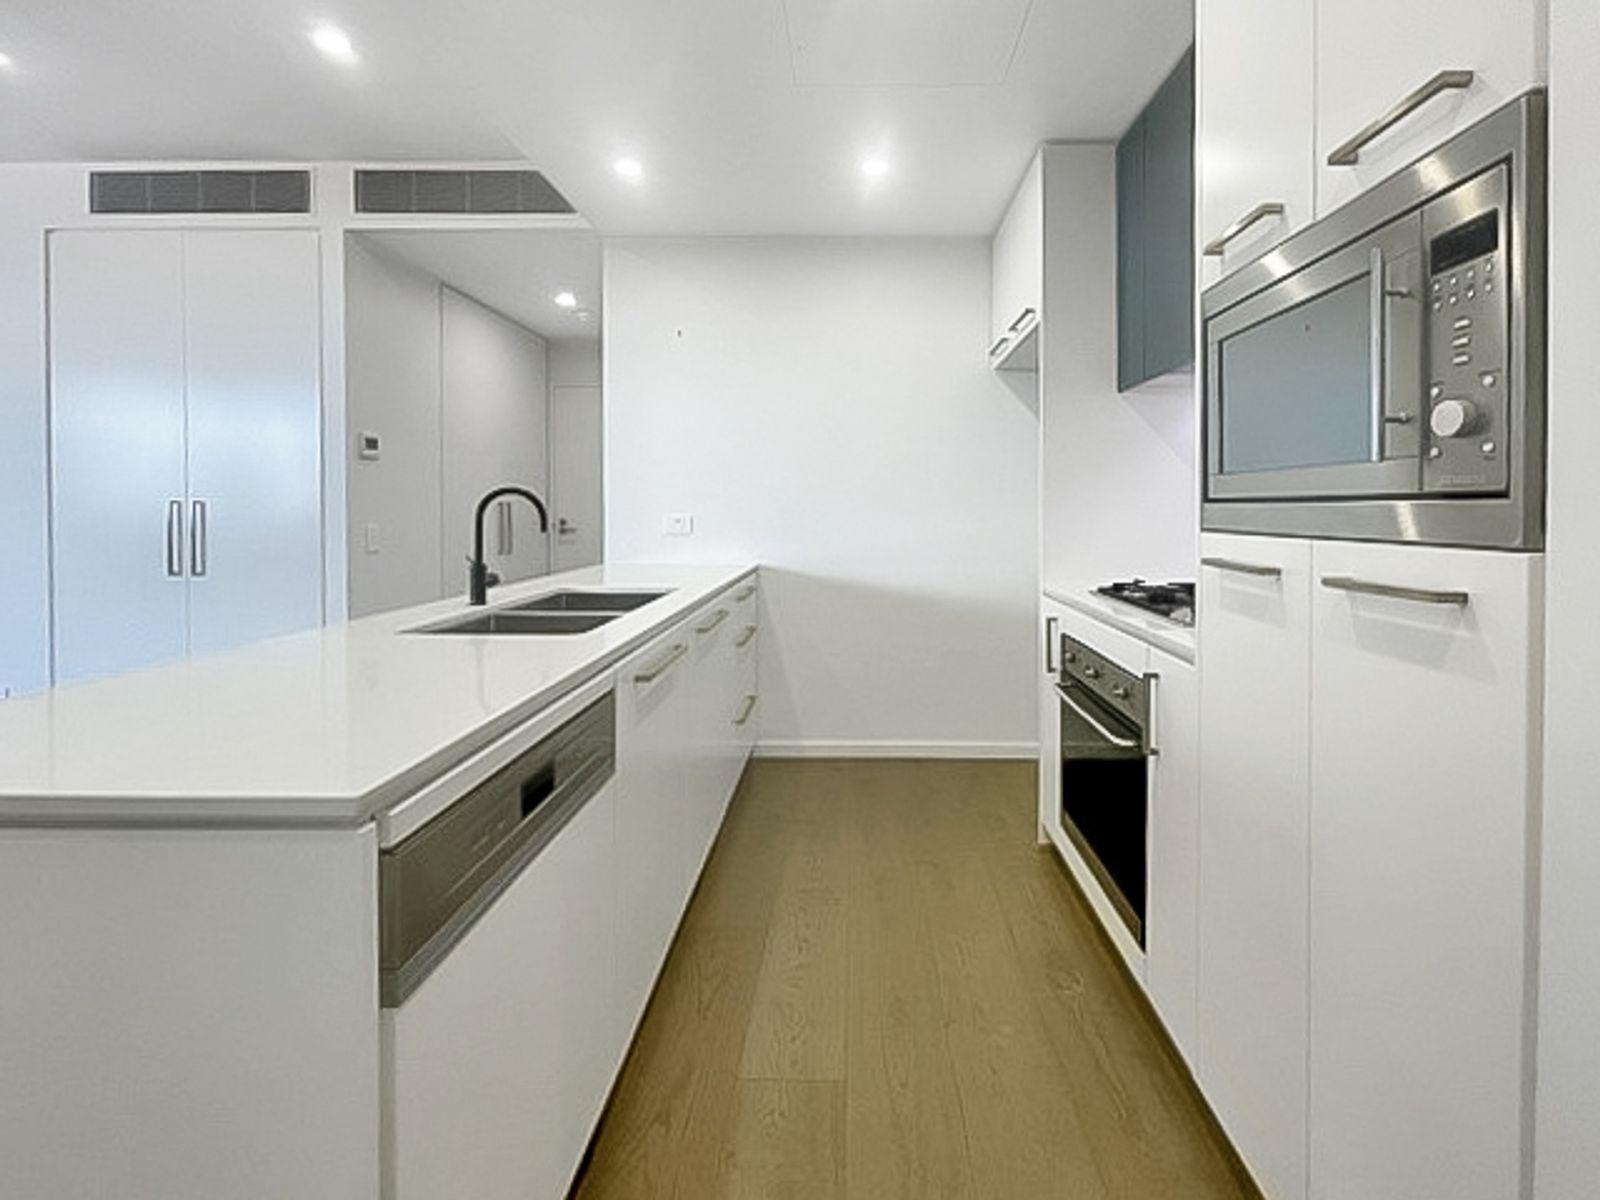 101/8 Wharf Road, Gladesville, NSW 2111